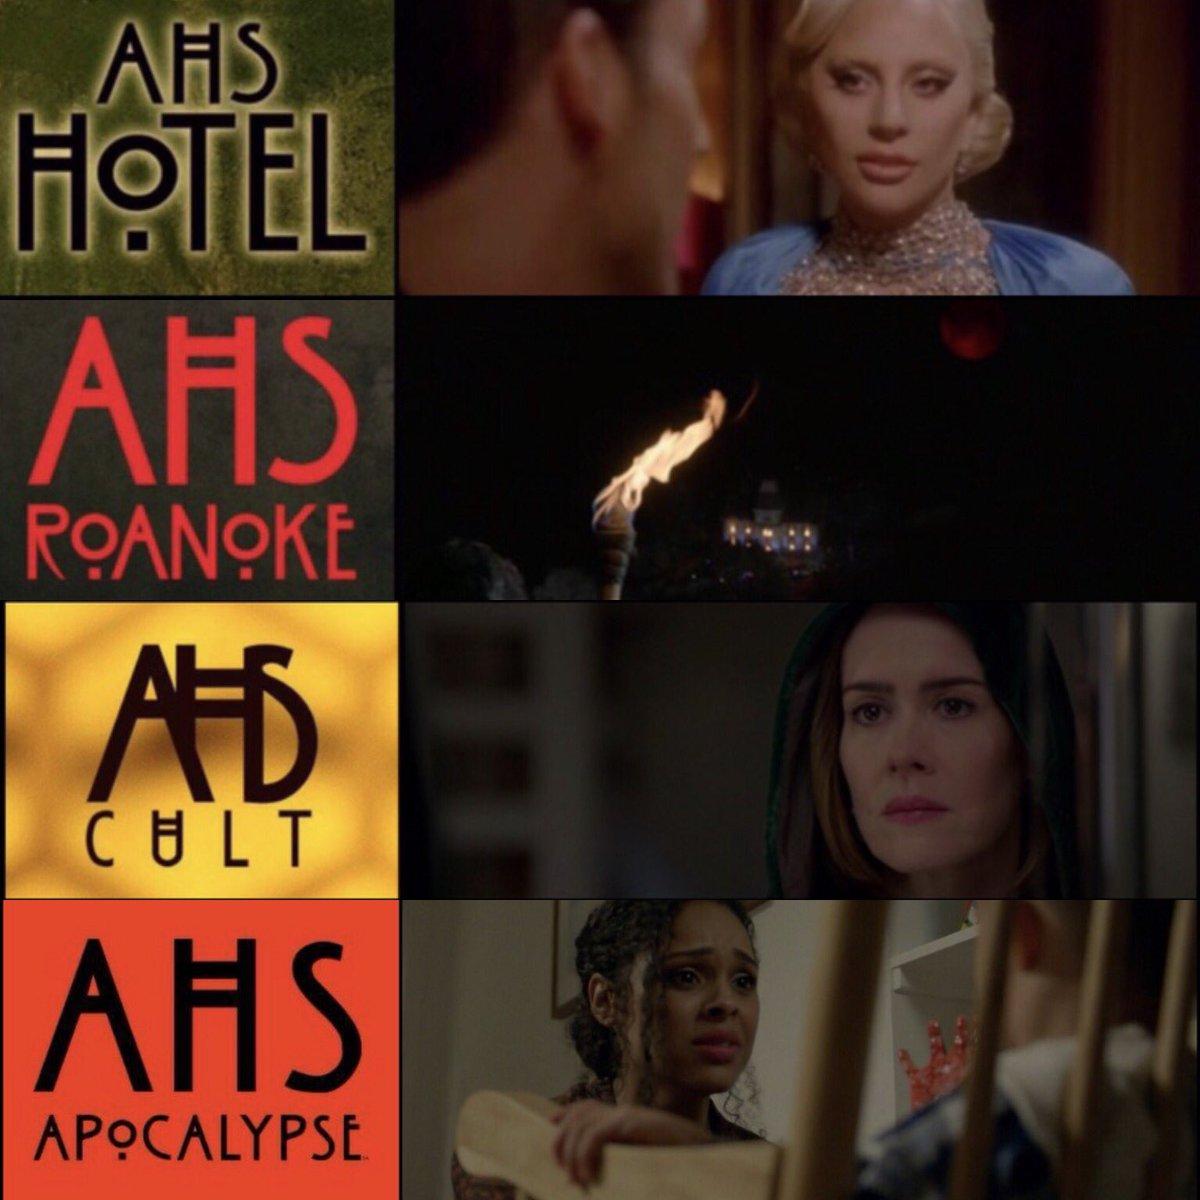 RT @_AHSCentral: The final scene of each season of 'American Horror Story'. (2011-2018) #AHSApocalypse https://t.co/Jhig3SbJV2